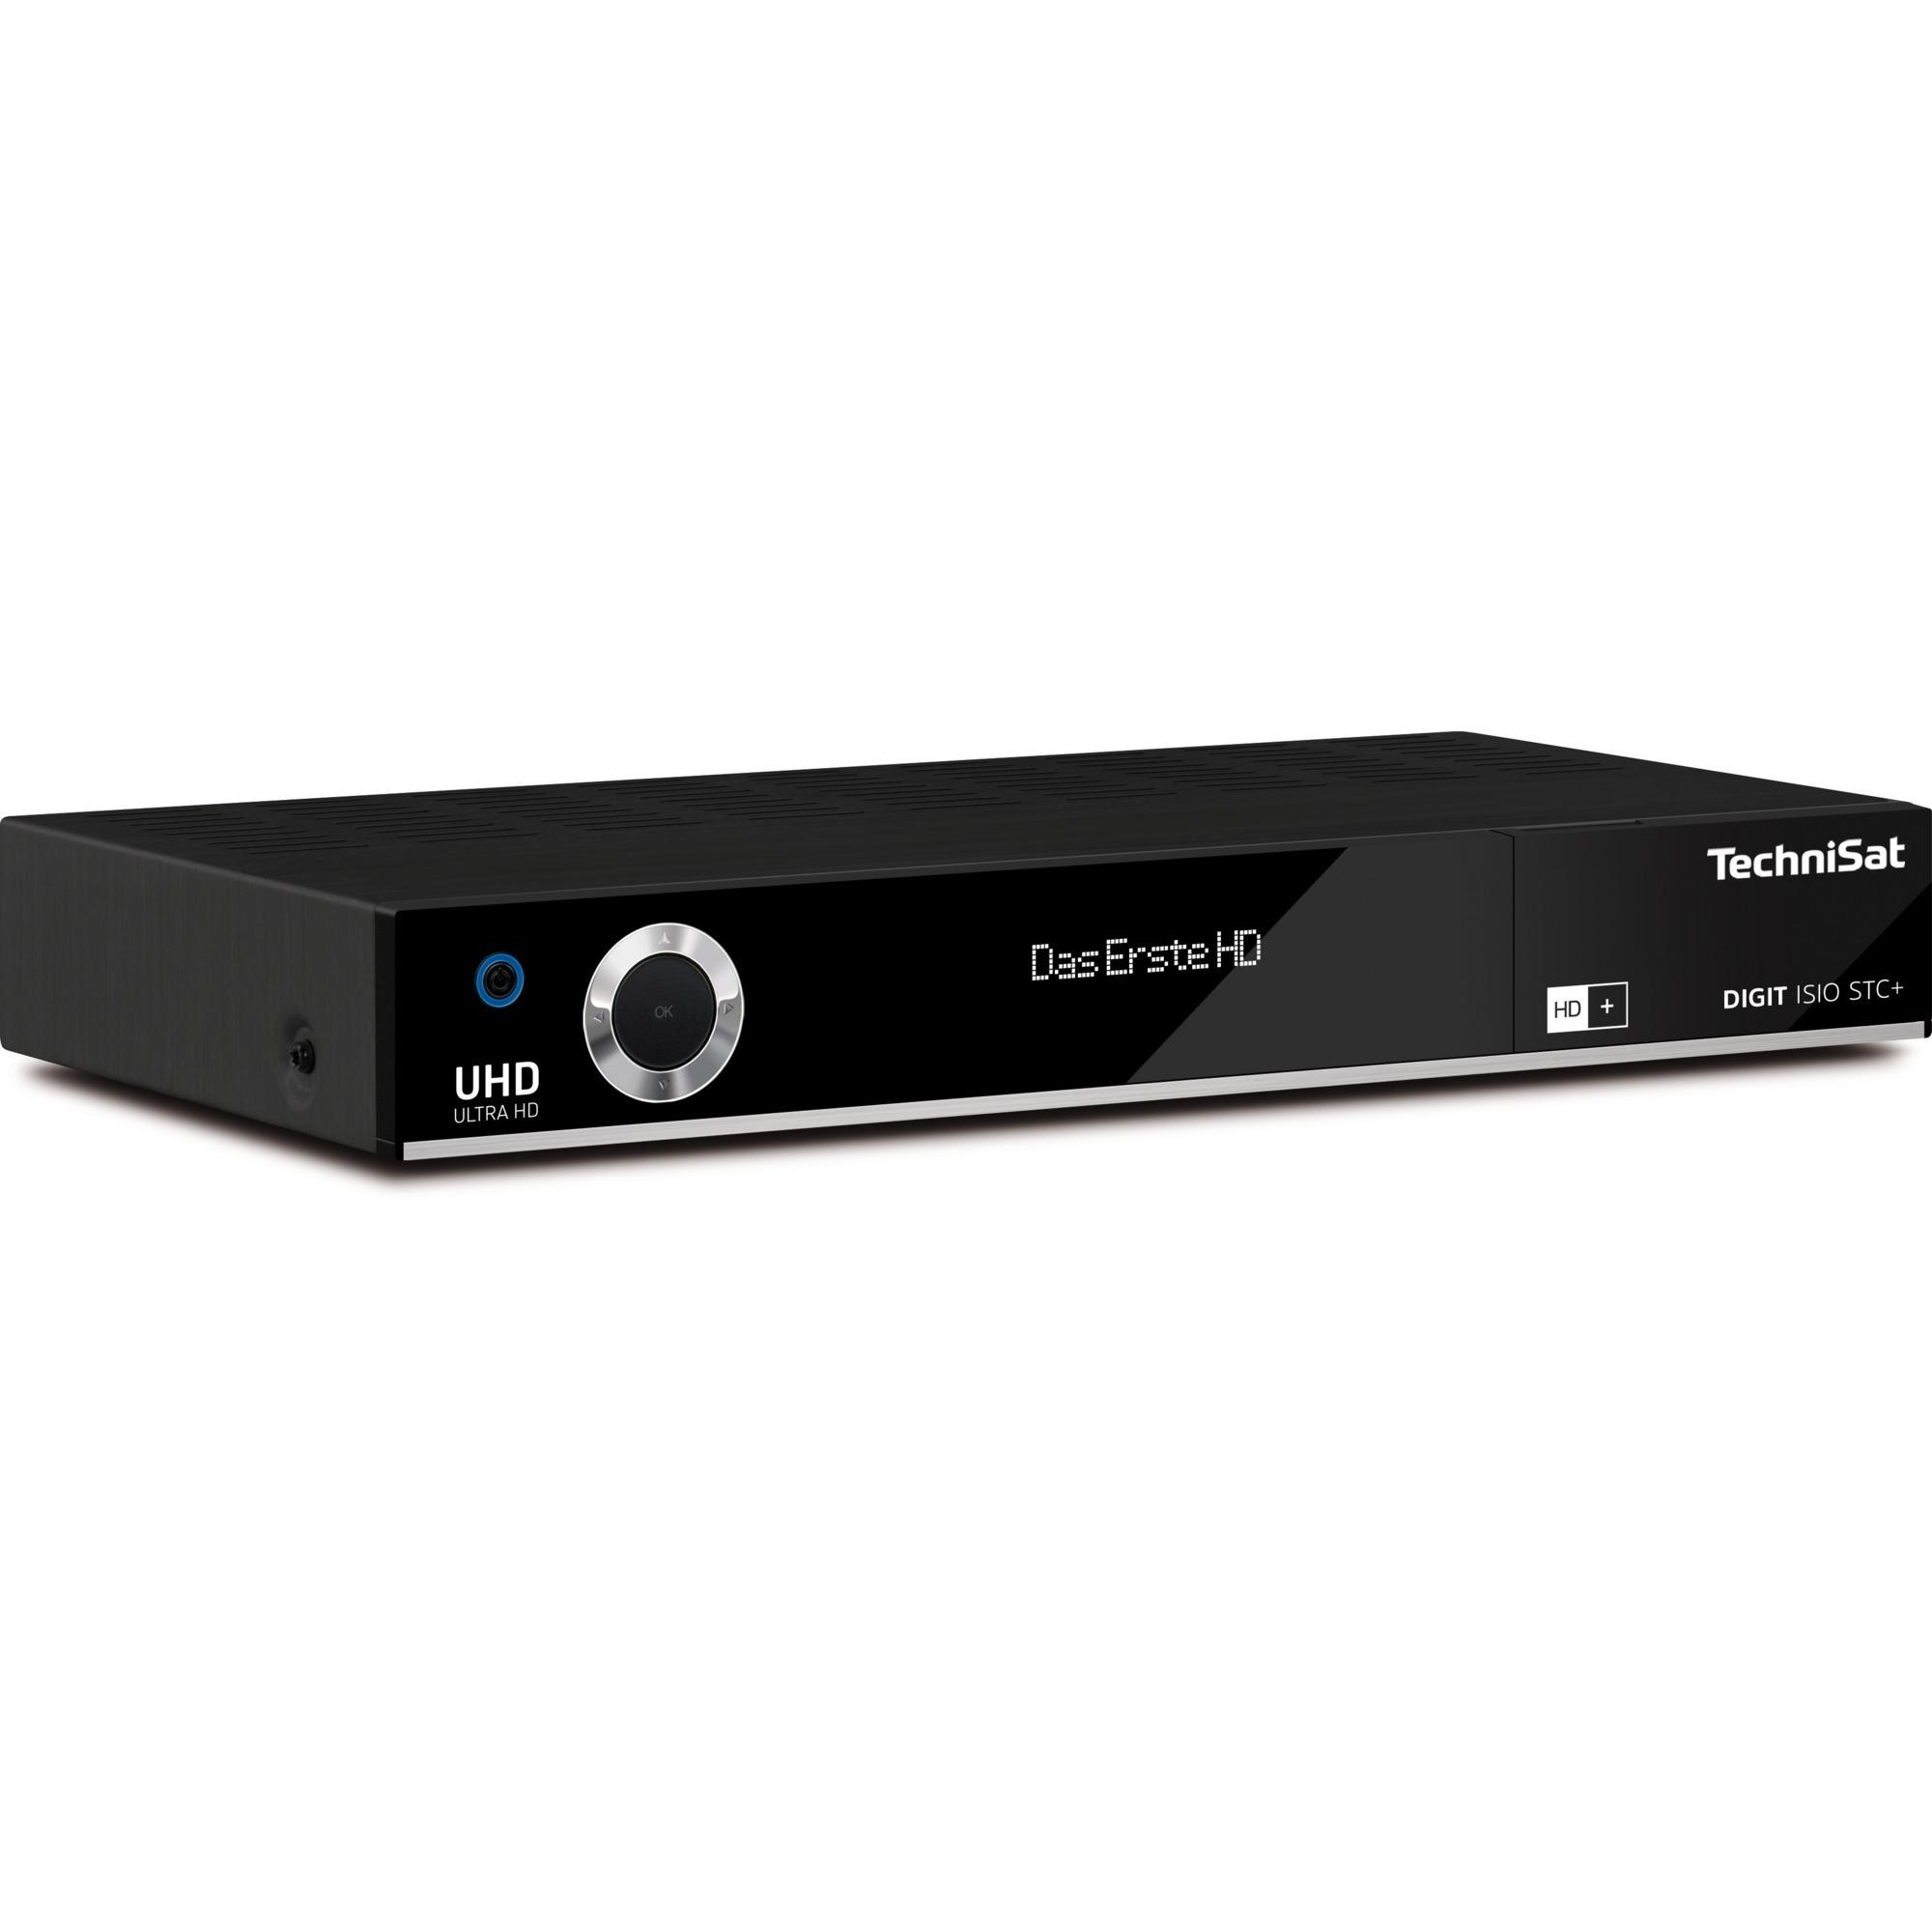 DIGIT ISIO STC+ Satellite Noir TV set-top boxe, Sat-/Kabel-/Terr.-Receiver